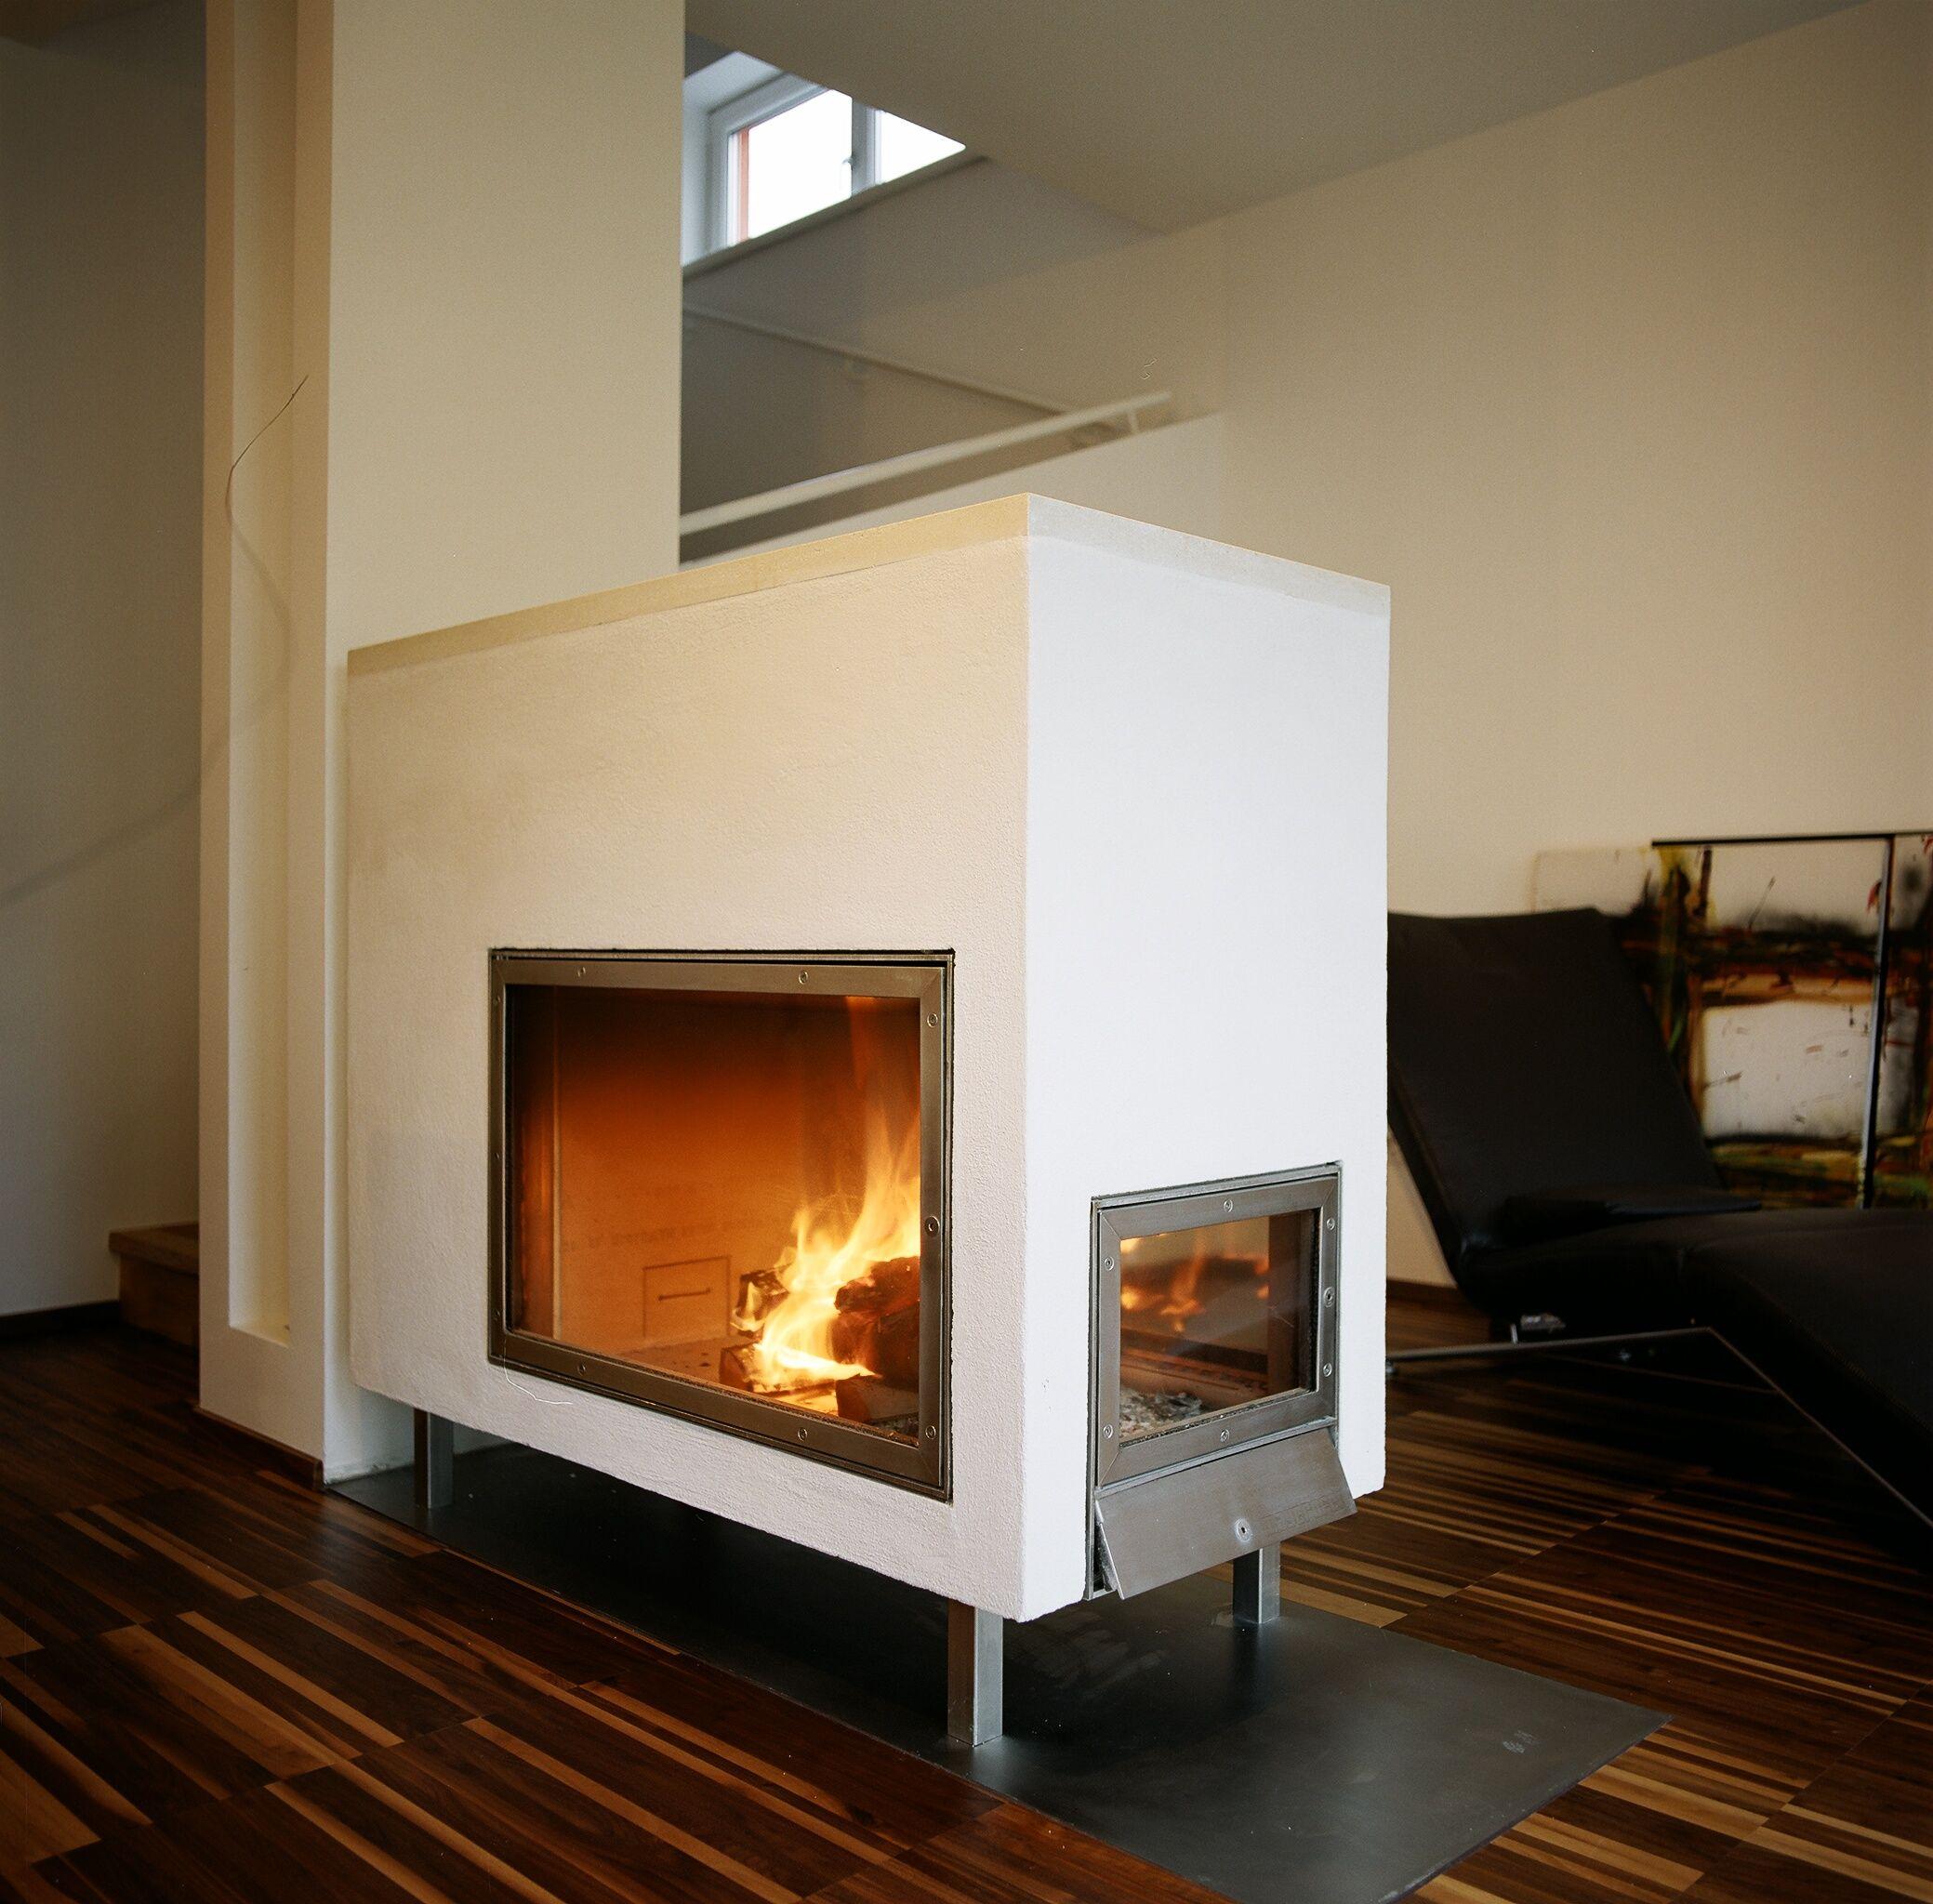 mayerofen wien kachelofen kamin kaminofen kachelofen. Black Bedroom Furniture Sets. Home Design Ideas